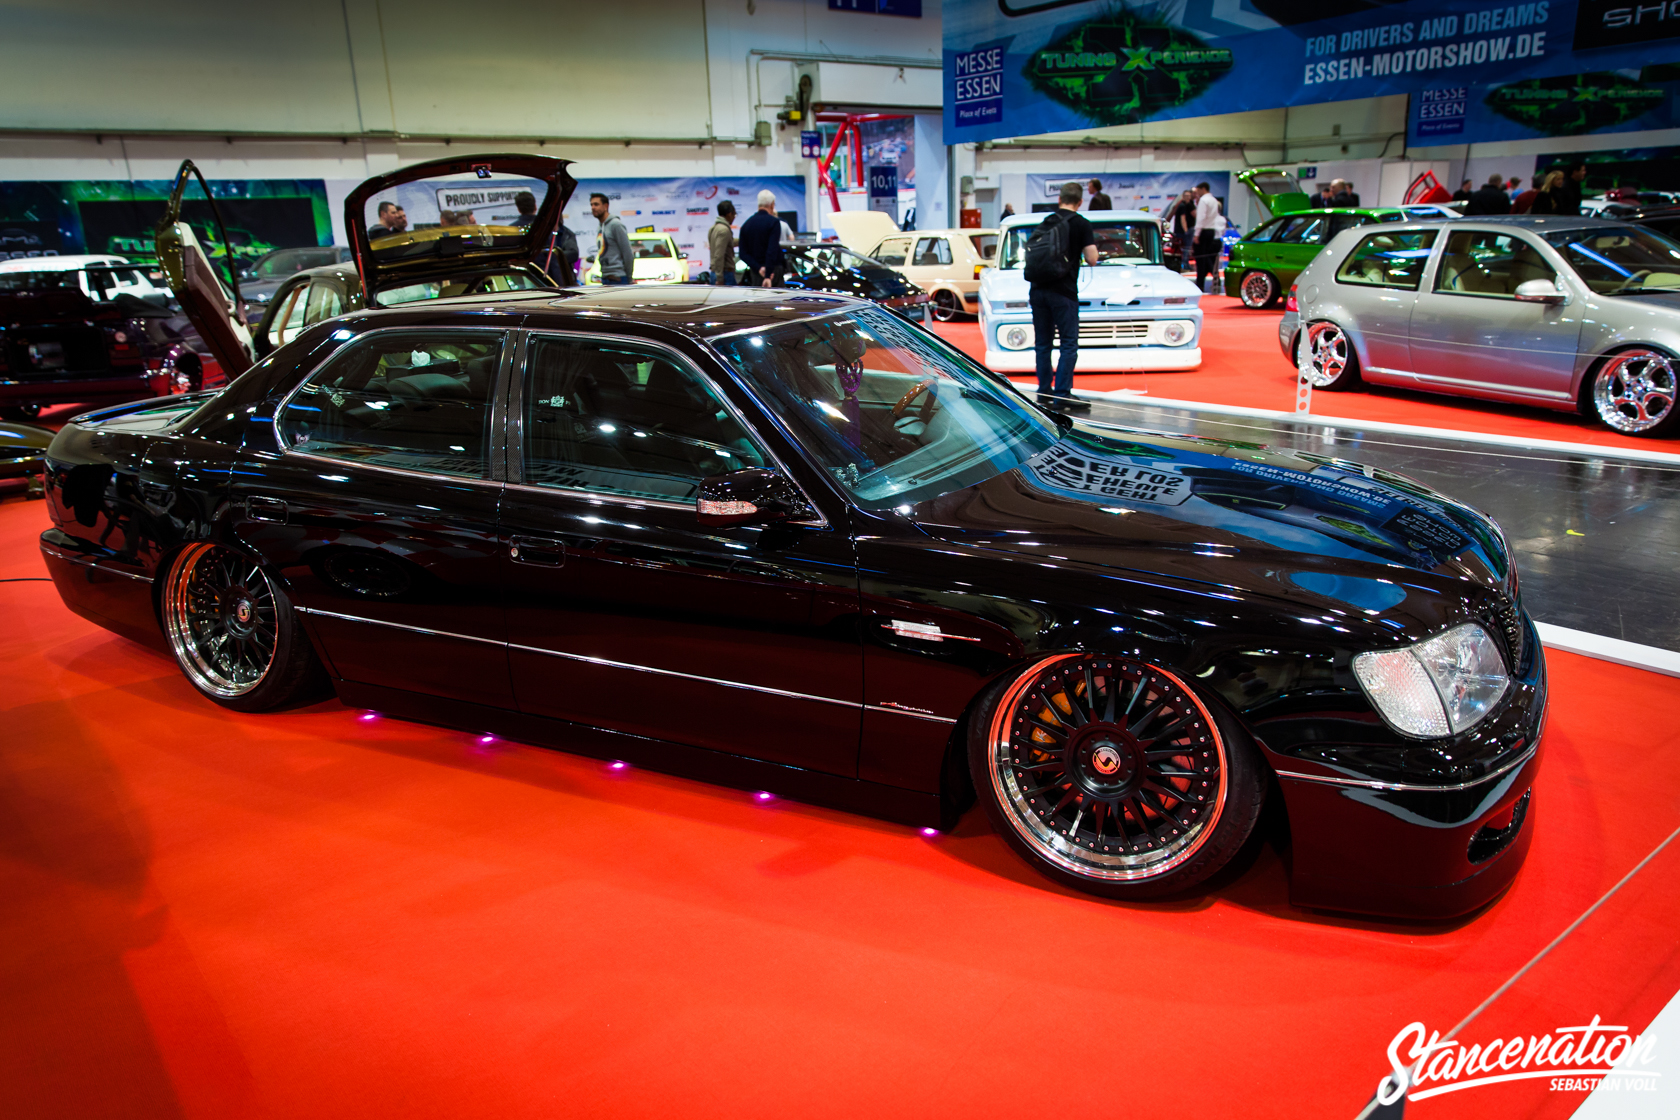 [Image: Essem-Motor-Show-2014-47.jpg]